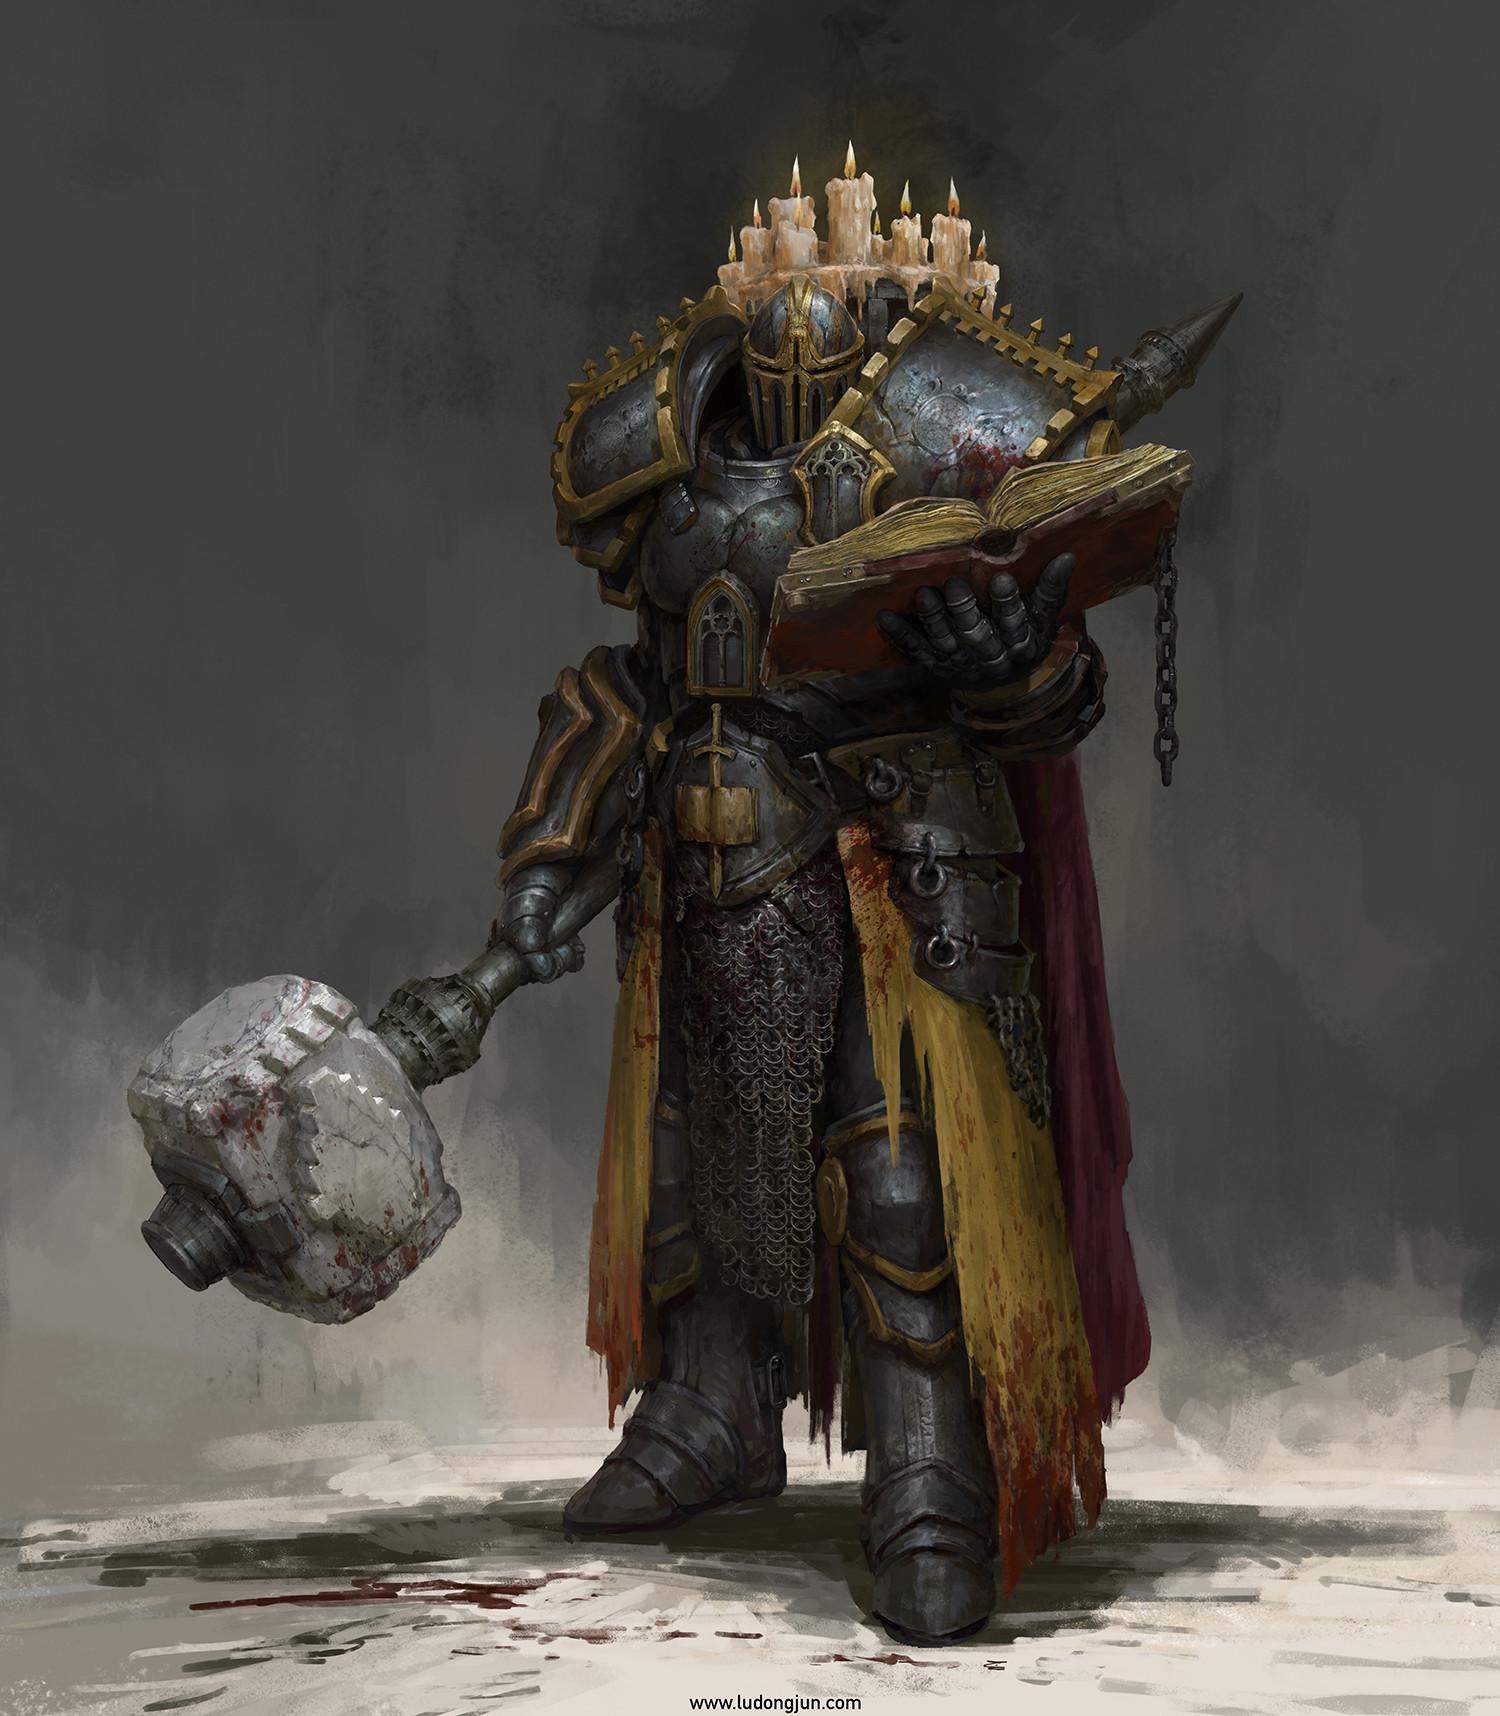 General 1500x1716 fantasy art fantasy armor concept art portrait display Russell Dongjun Lu Dark Castle Warrior